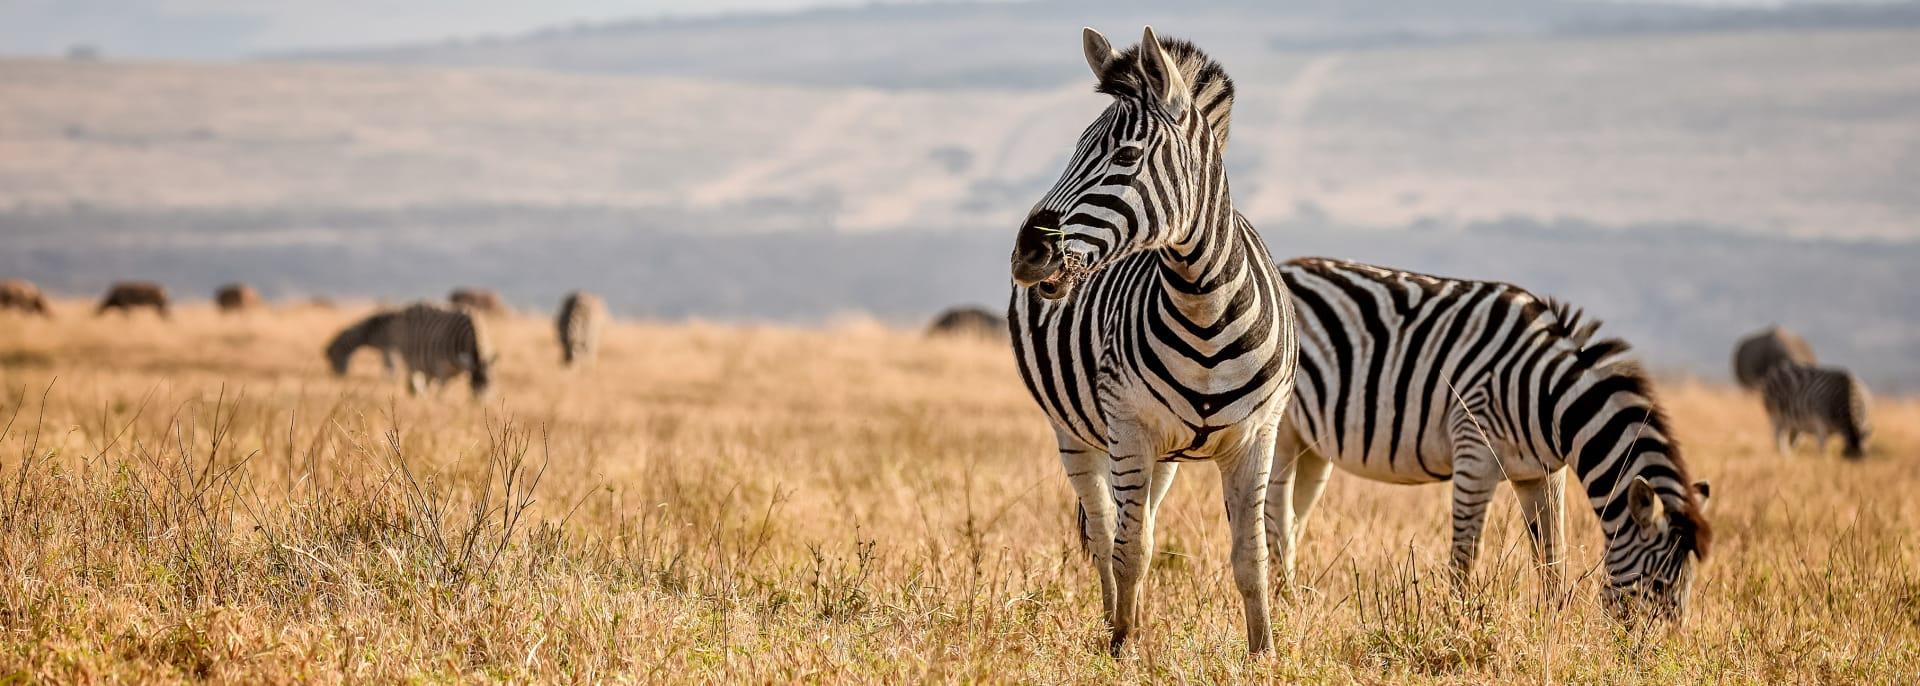 Zebra in Durban, Südafrika